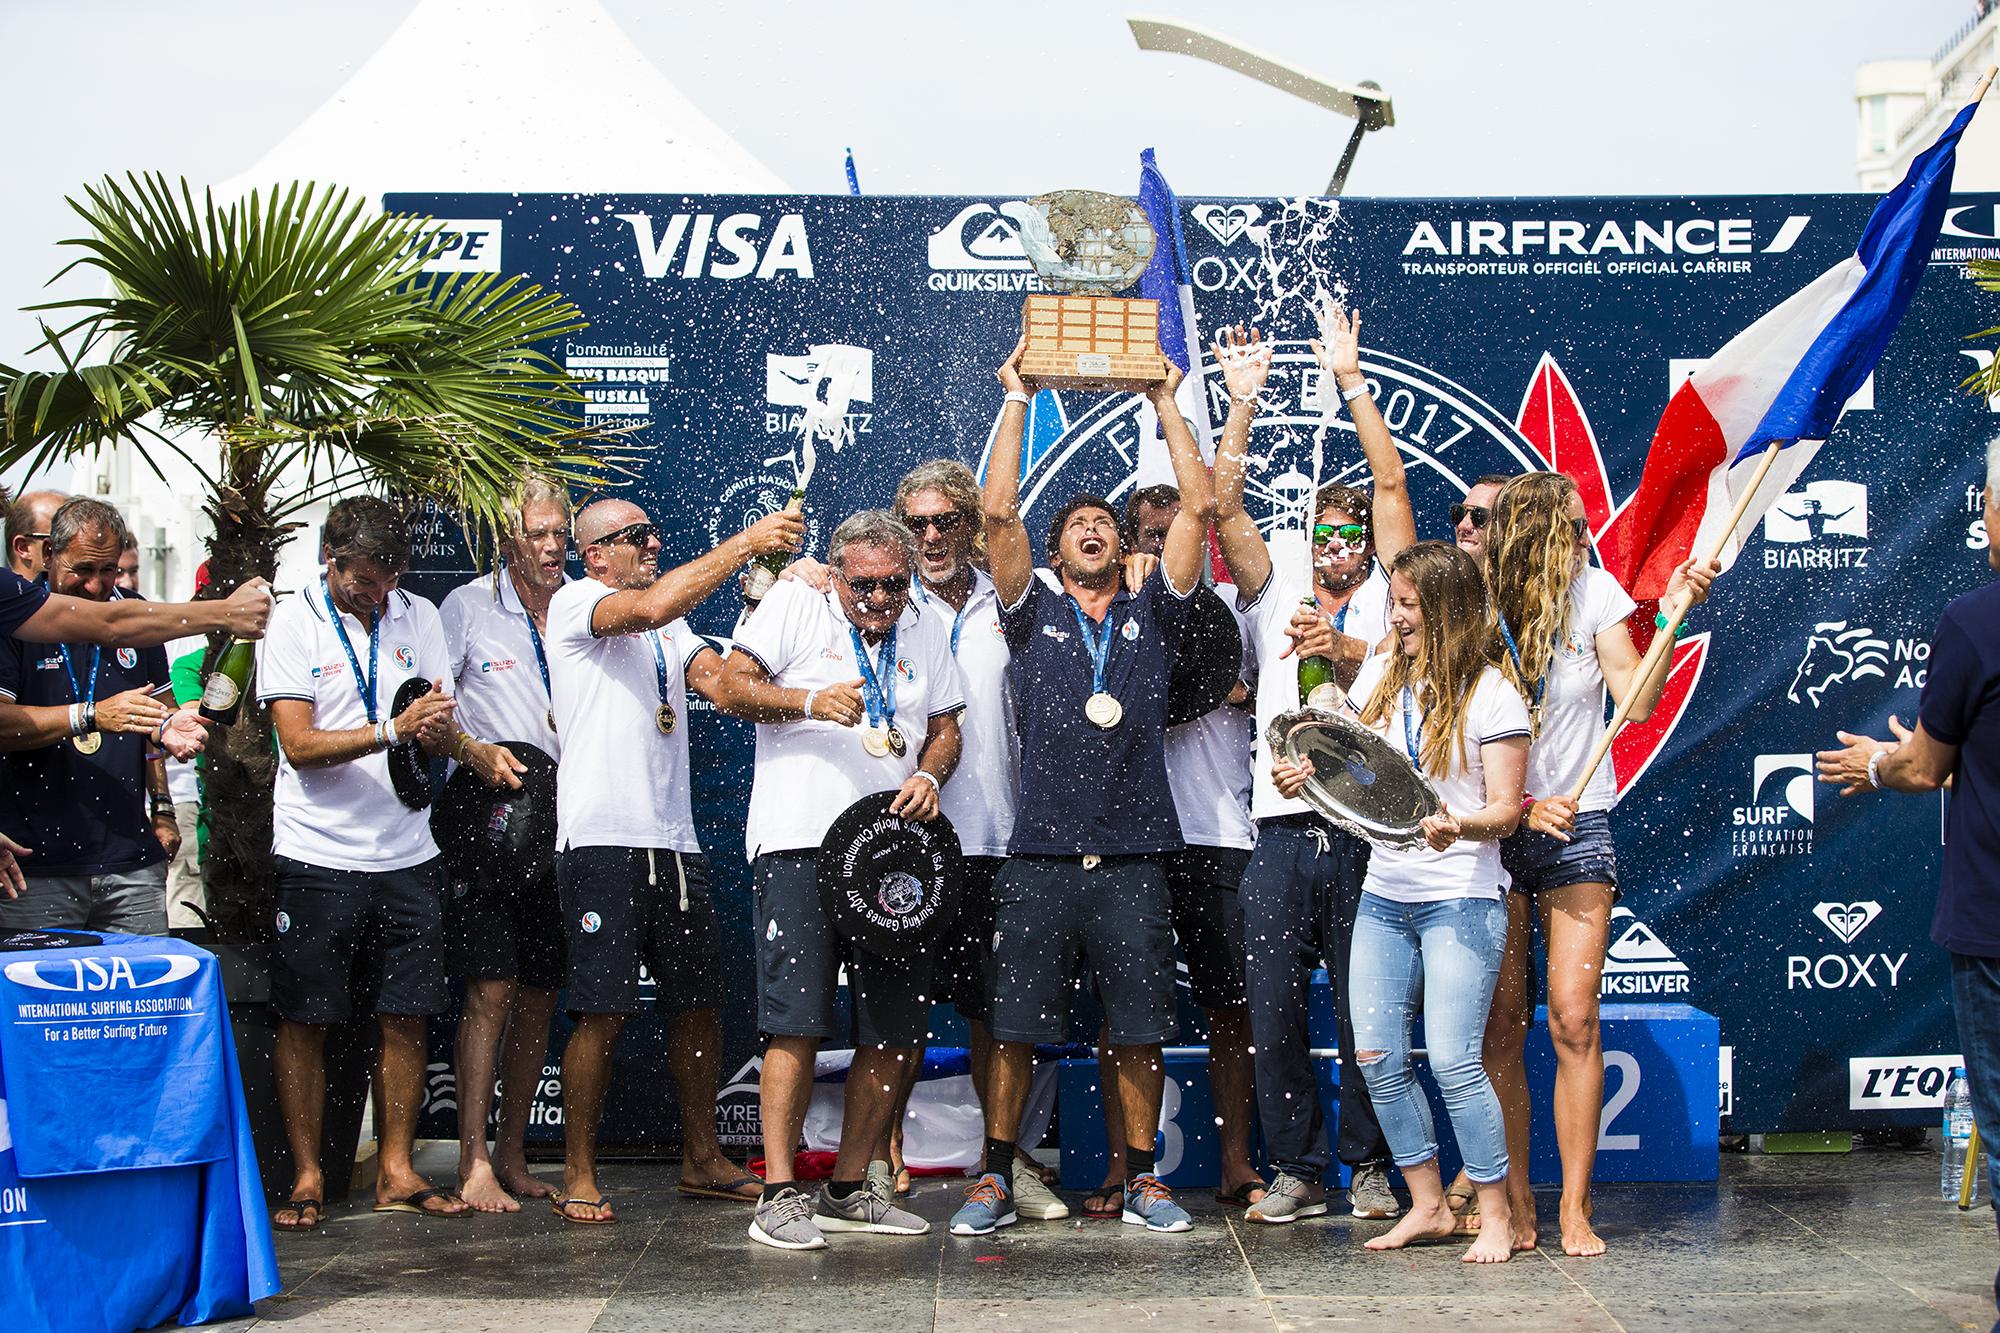 podium-france-ISA-world-surfing-games-2017-biarritz-guillaume-arrieta-we-creative